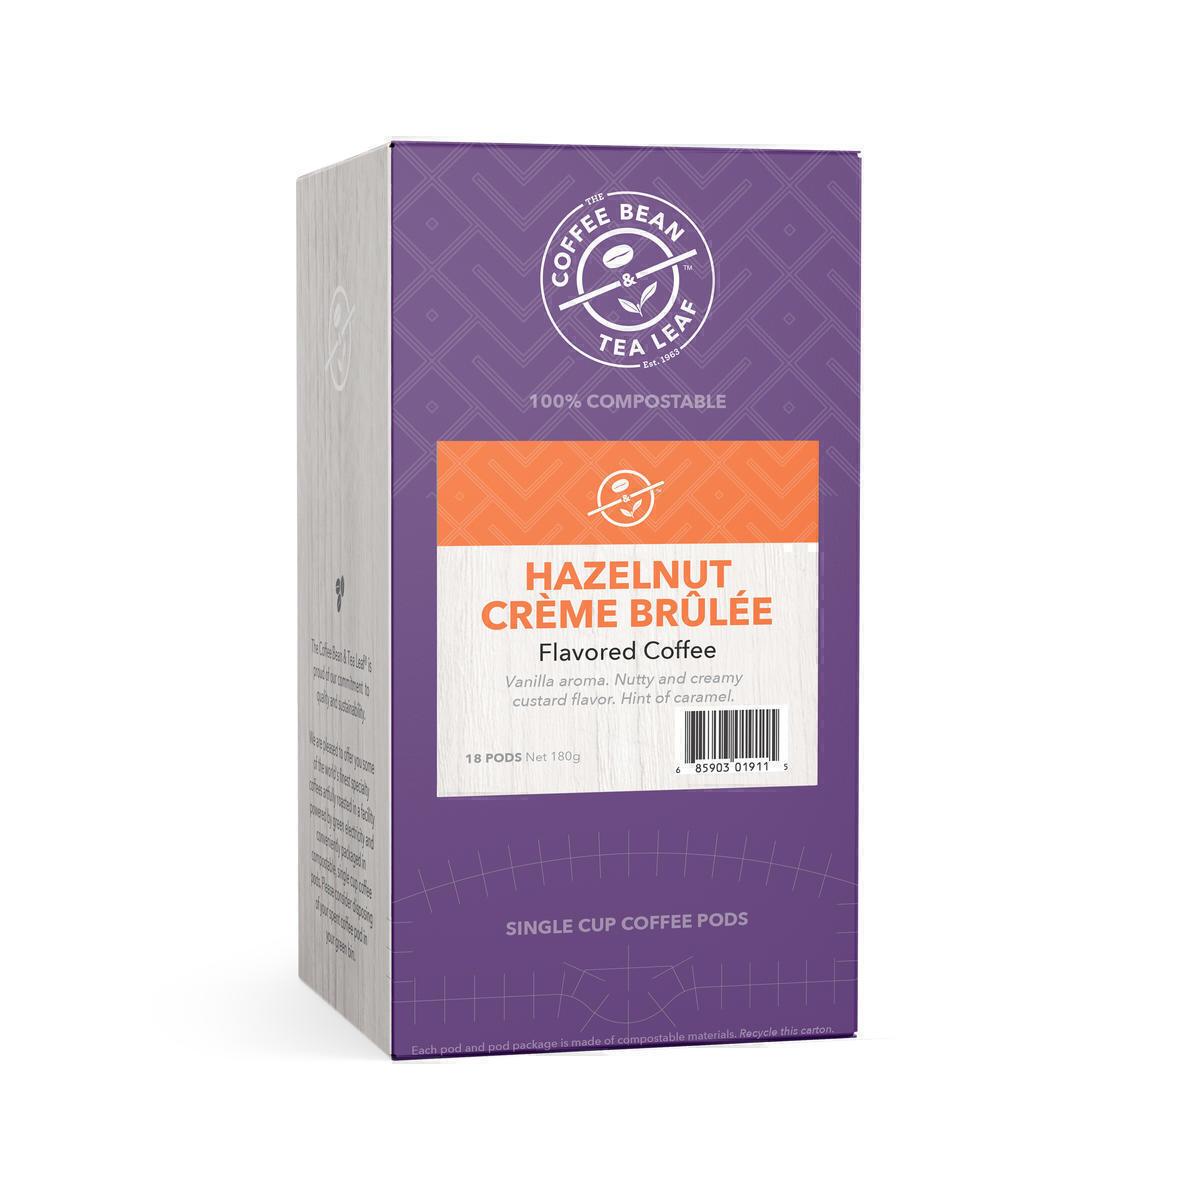 Coffee Bean & Tea Leaf Hazelnut Creme Brulee POD